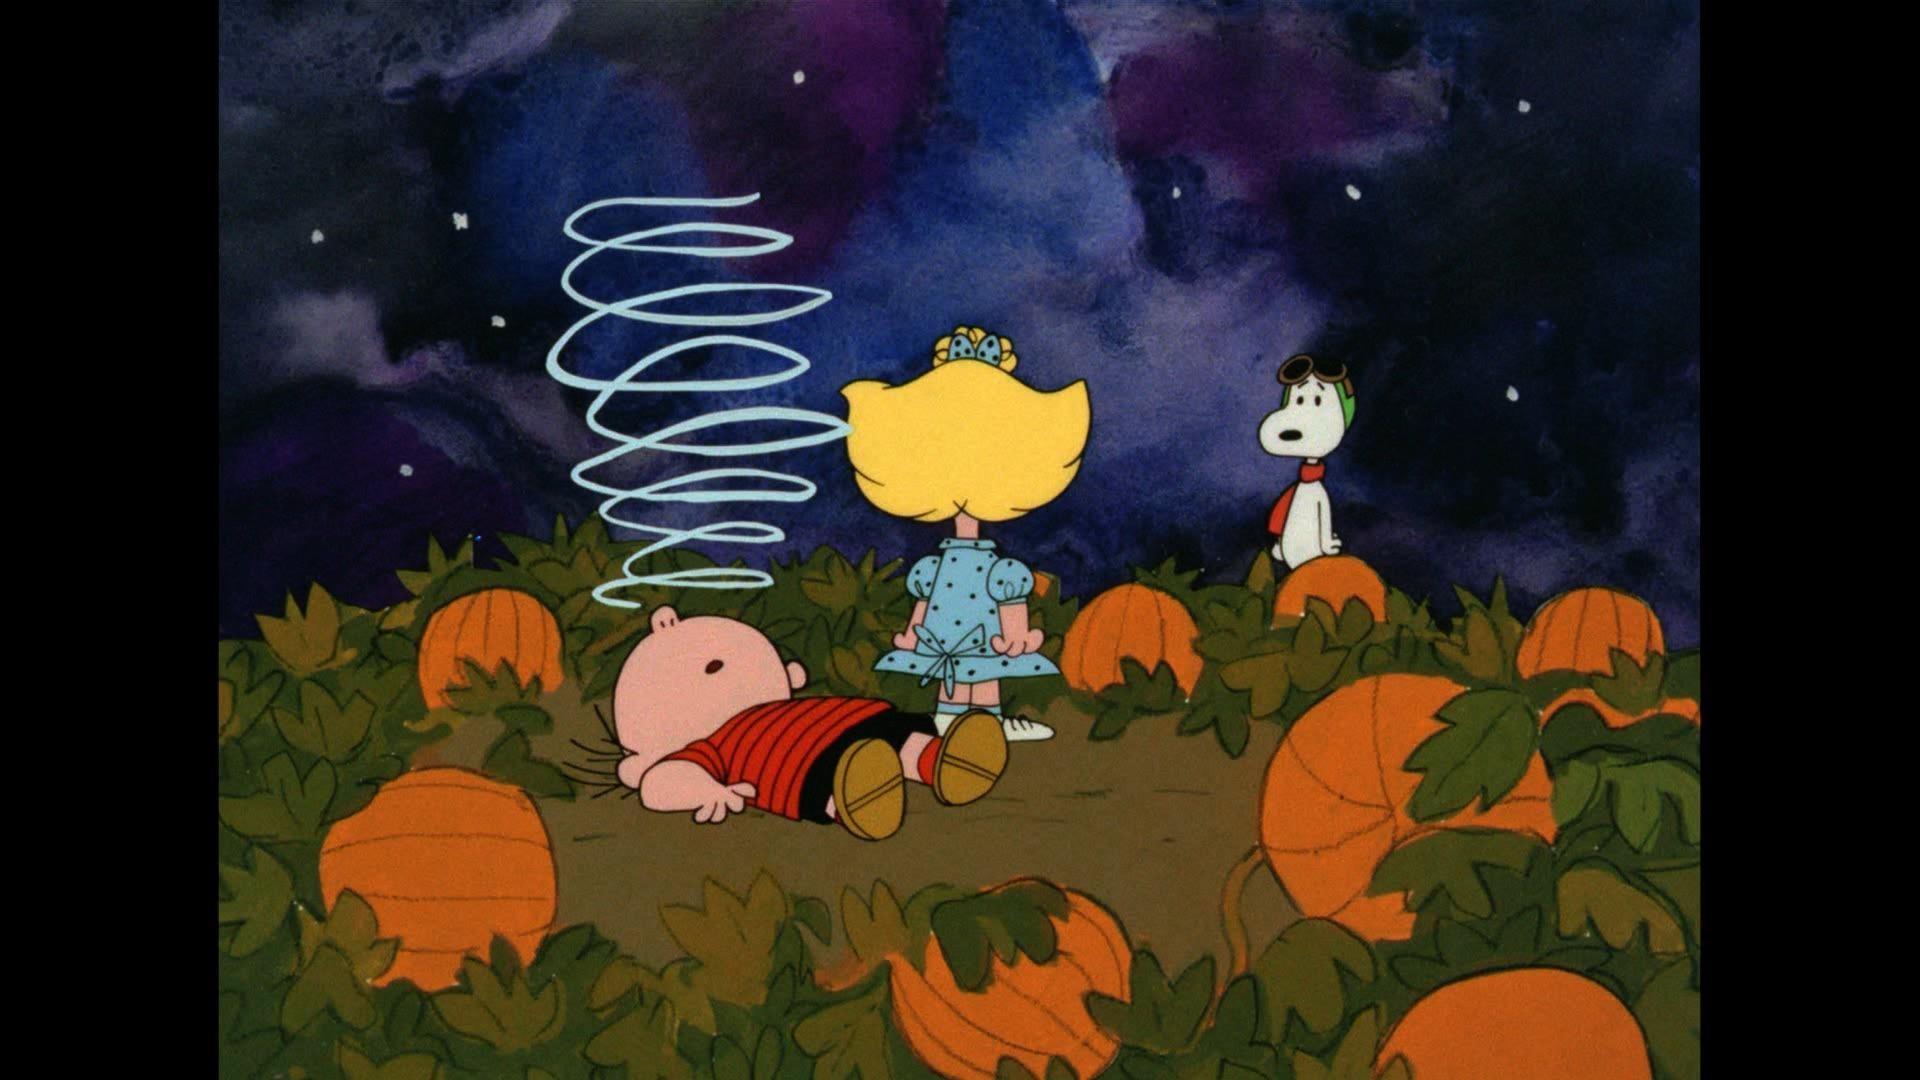 Great Pumpkin Charlie Brown Wallpaper 2458 Download Free HD .